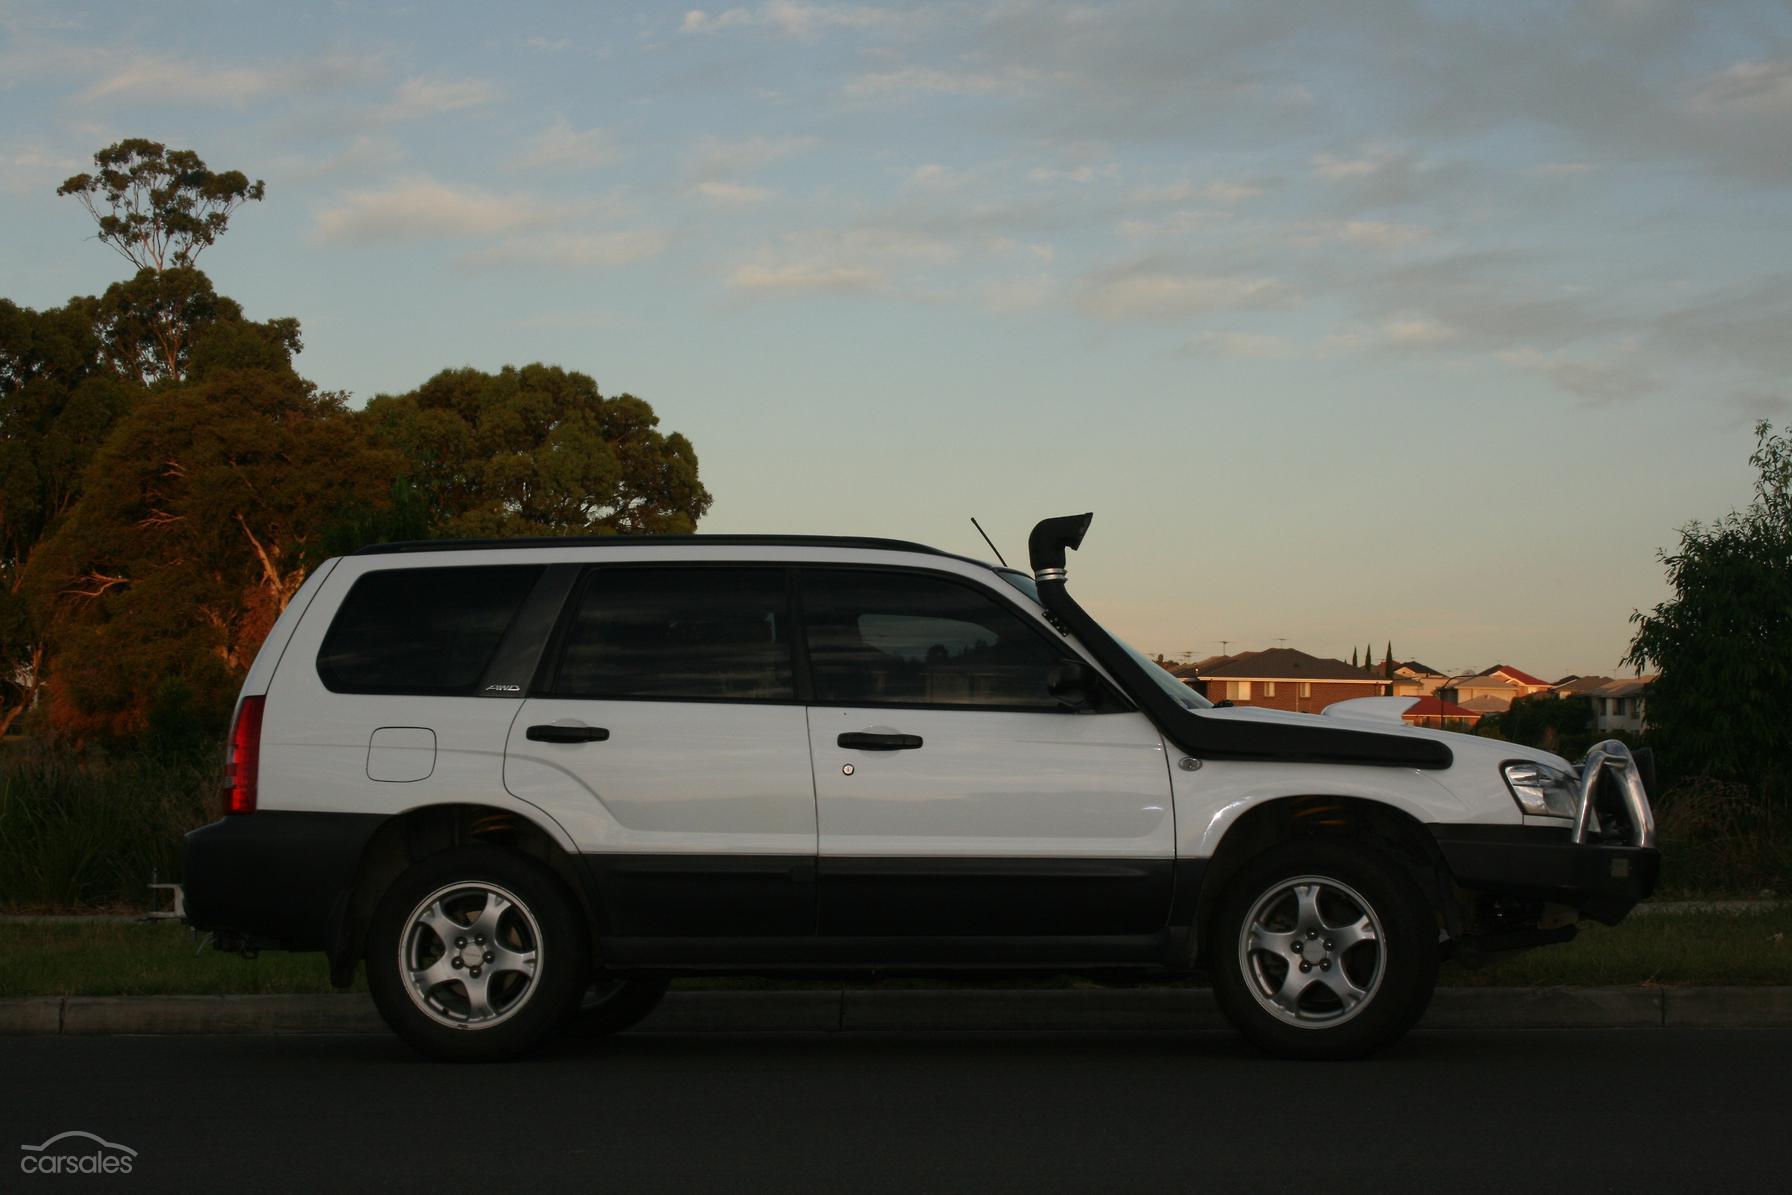 2004 Subaru Forester XT 79V Manual AWD MY04-SSE-AD-5750651